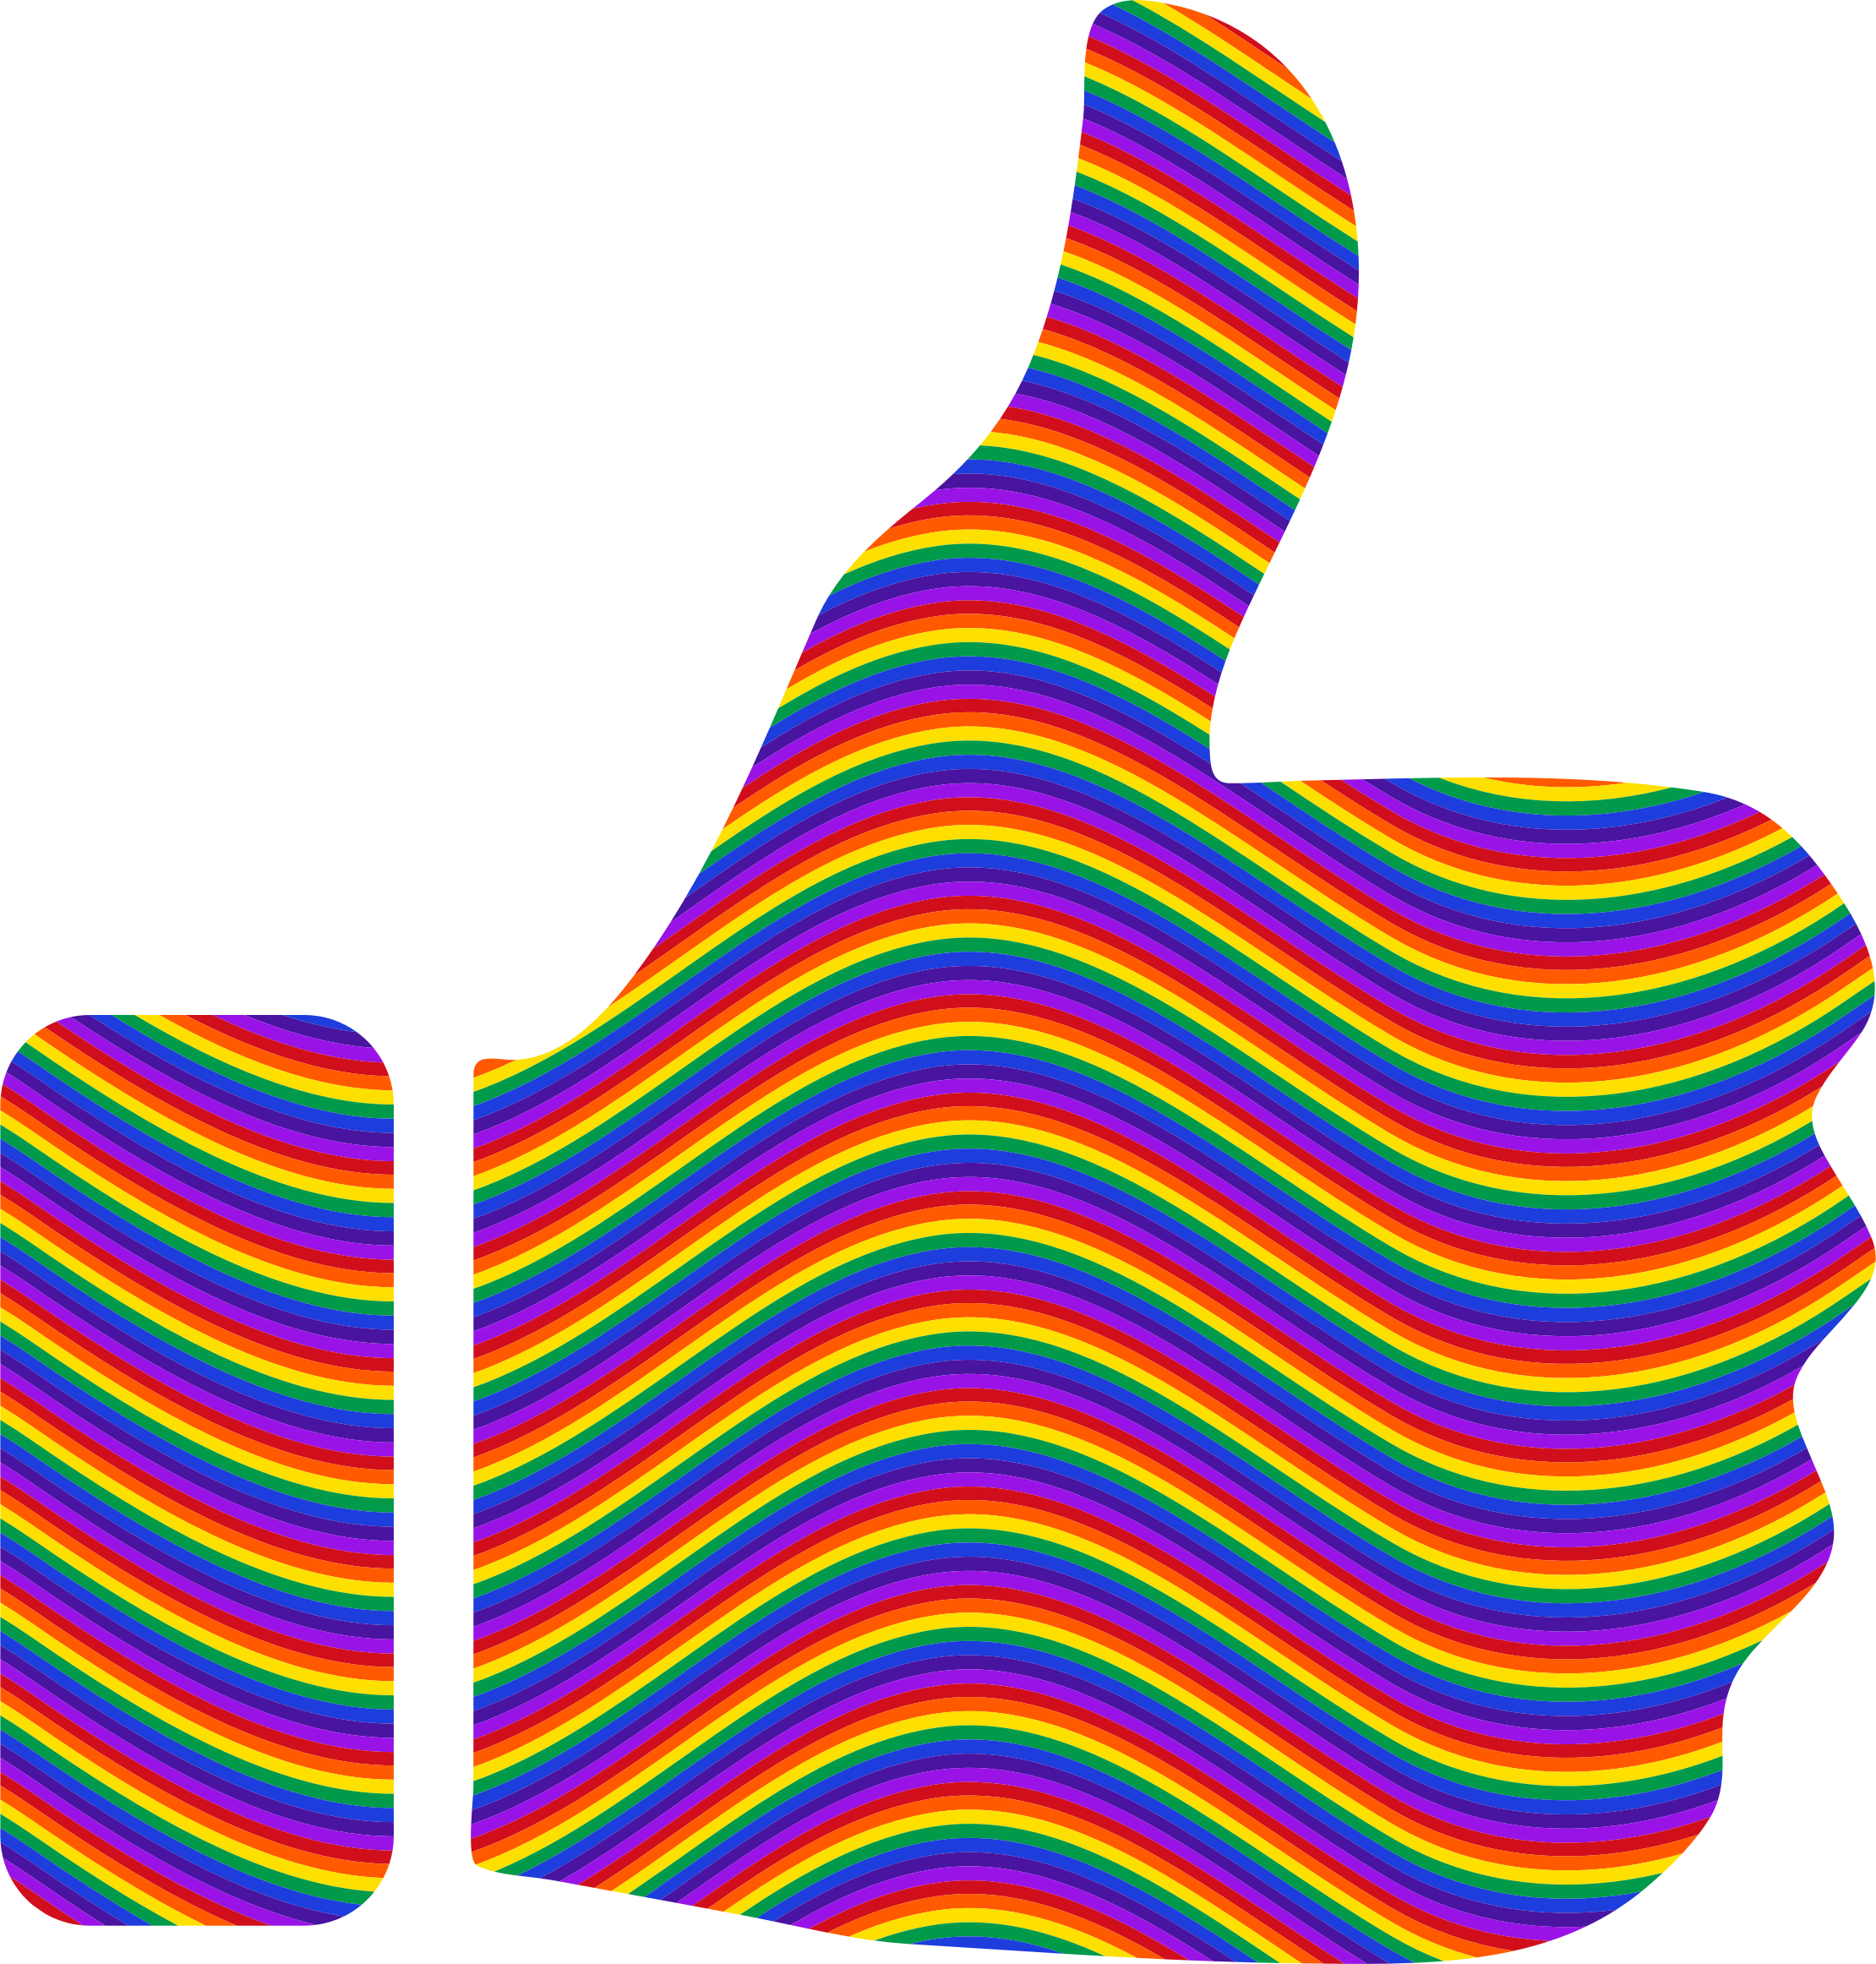 Thumbs up big image. Waves clipart rainbow